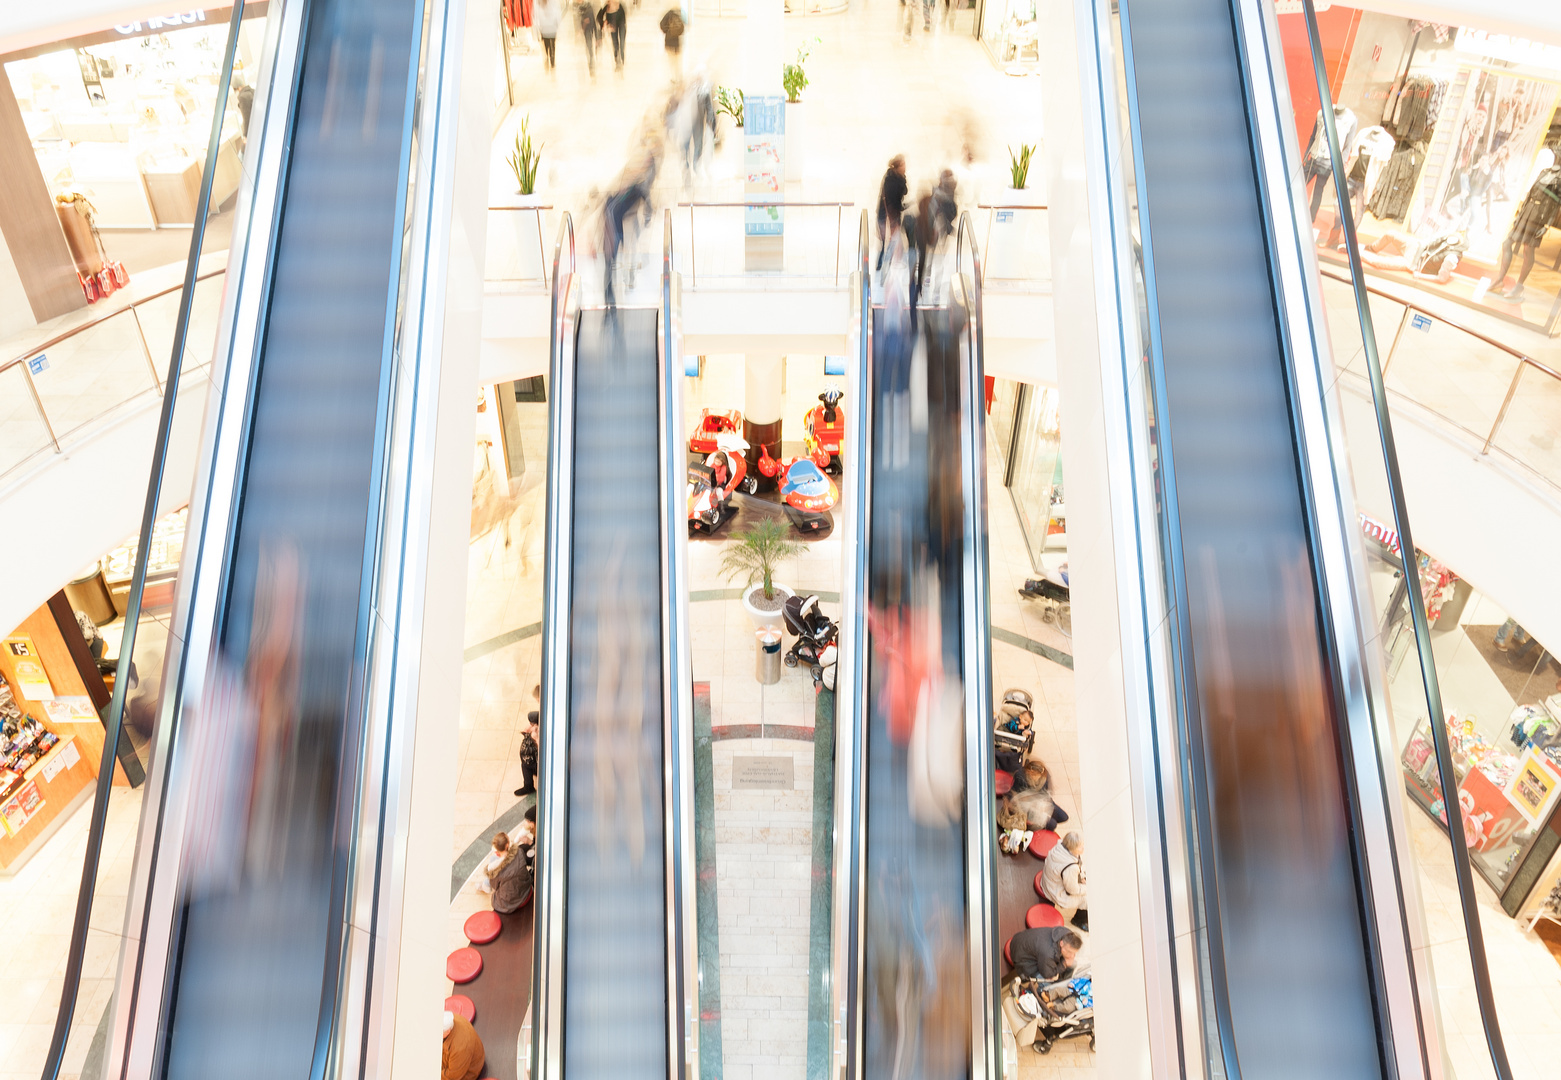 hds (high dynamic shopping) 2